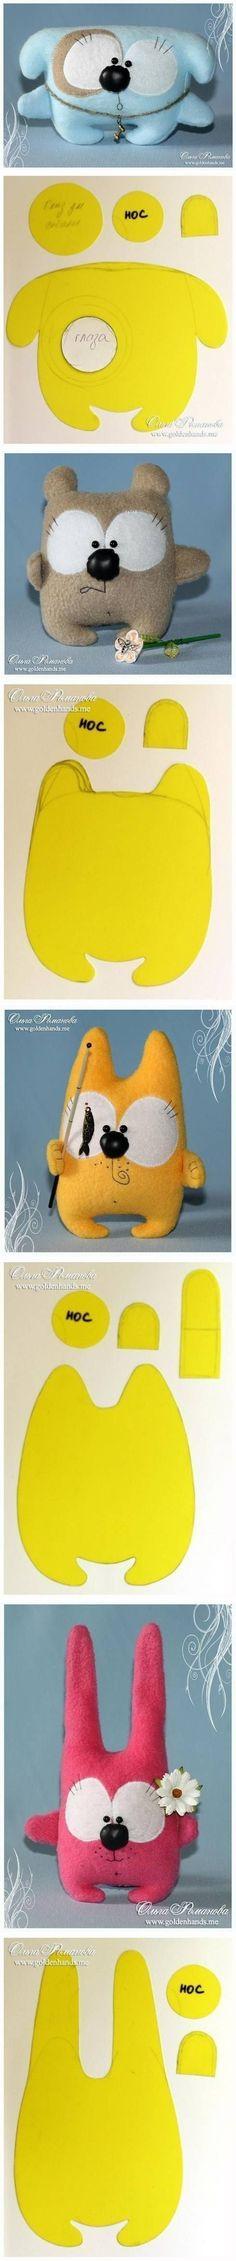 DIY Cute Fabric Toys Patterns